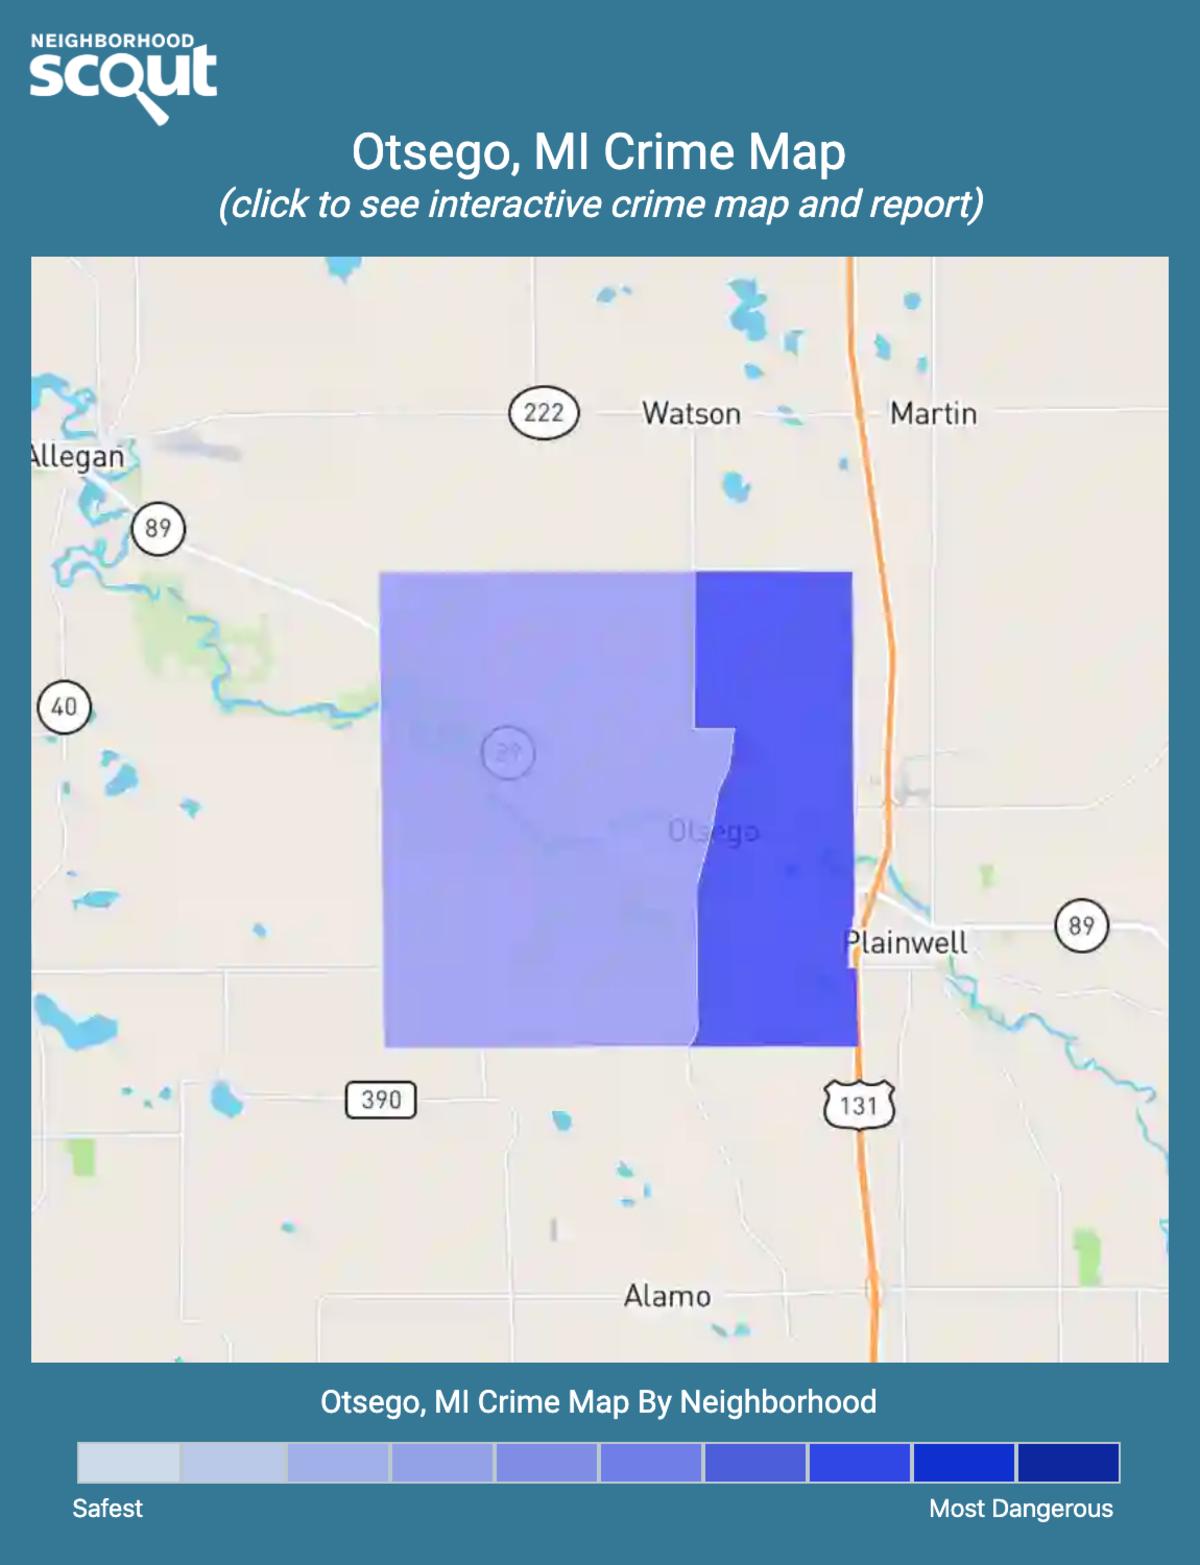 Otsego, Michigan crime map